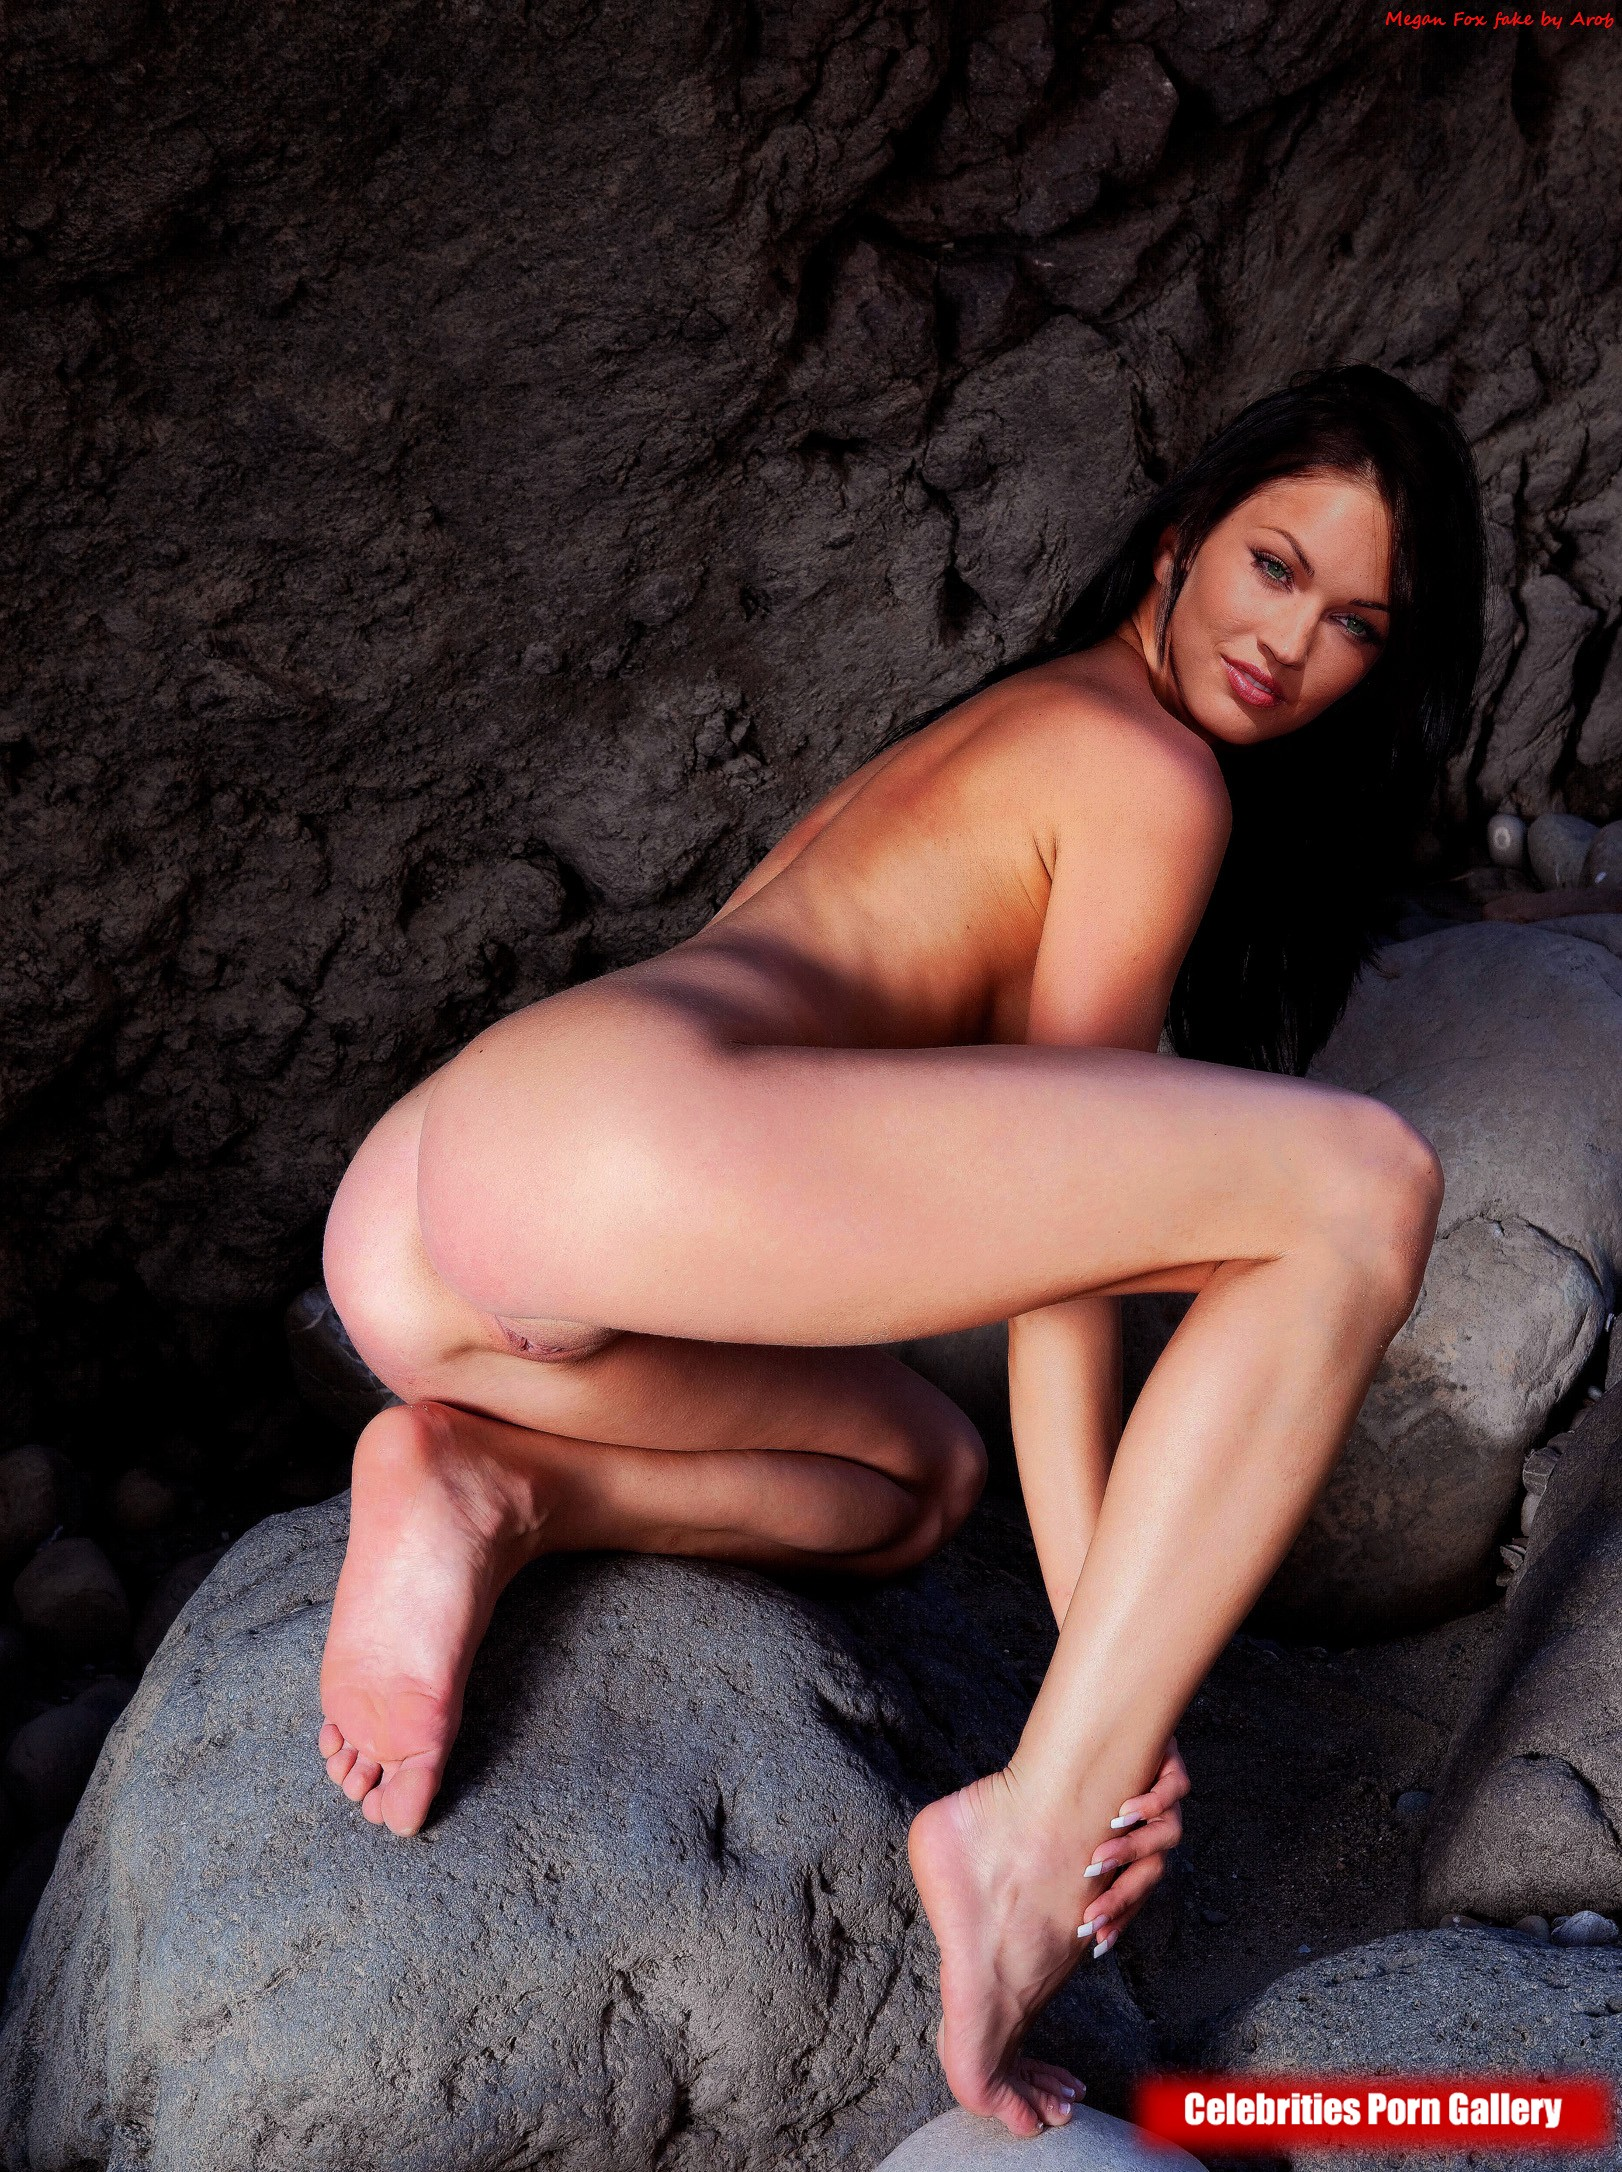 [UGH]! Movie Actress Megan Fox Nude Leaked Pics